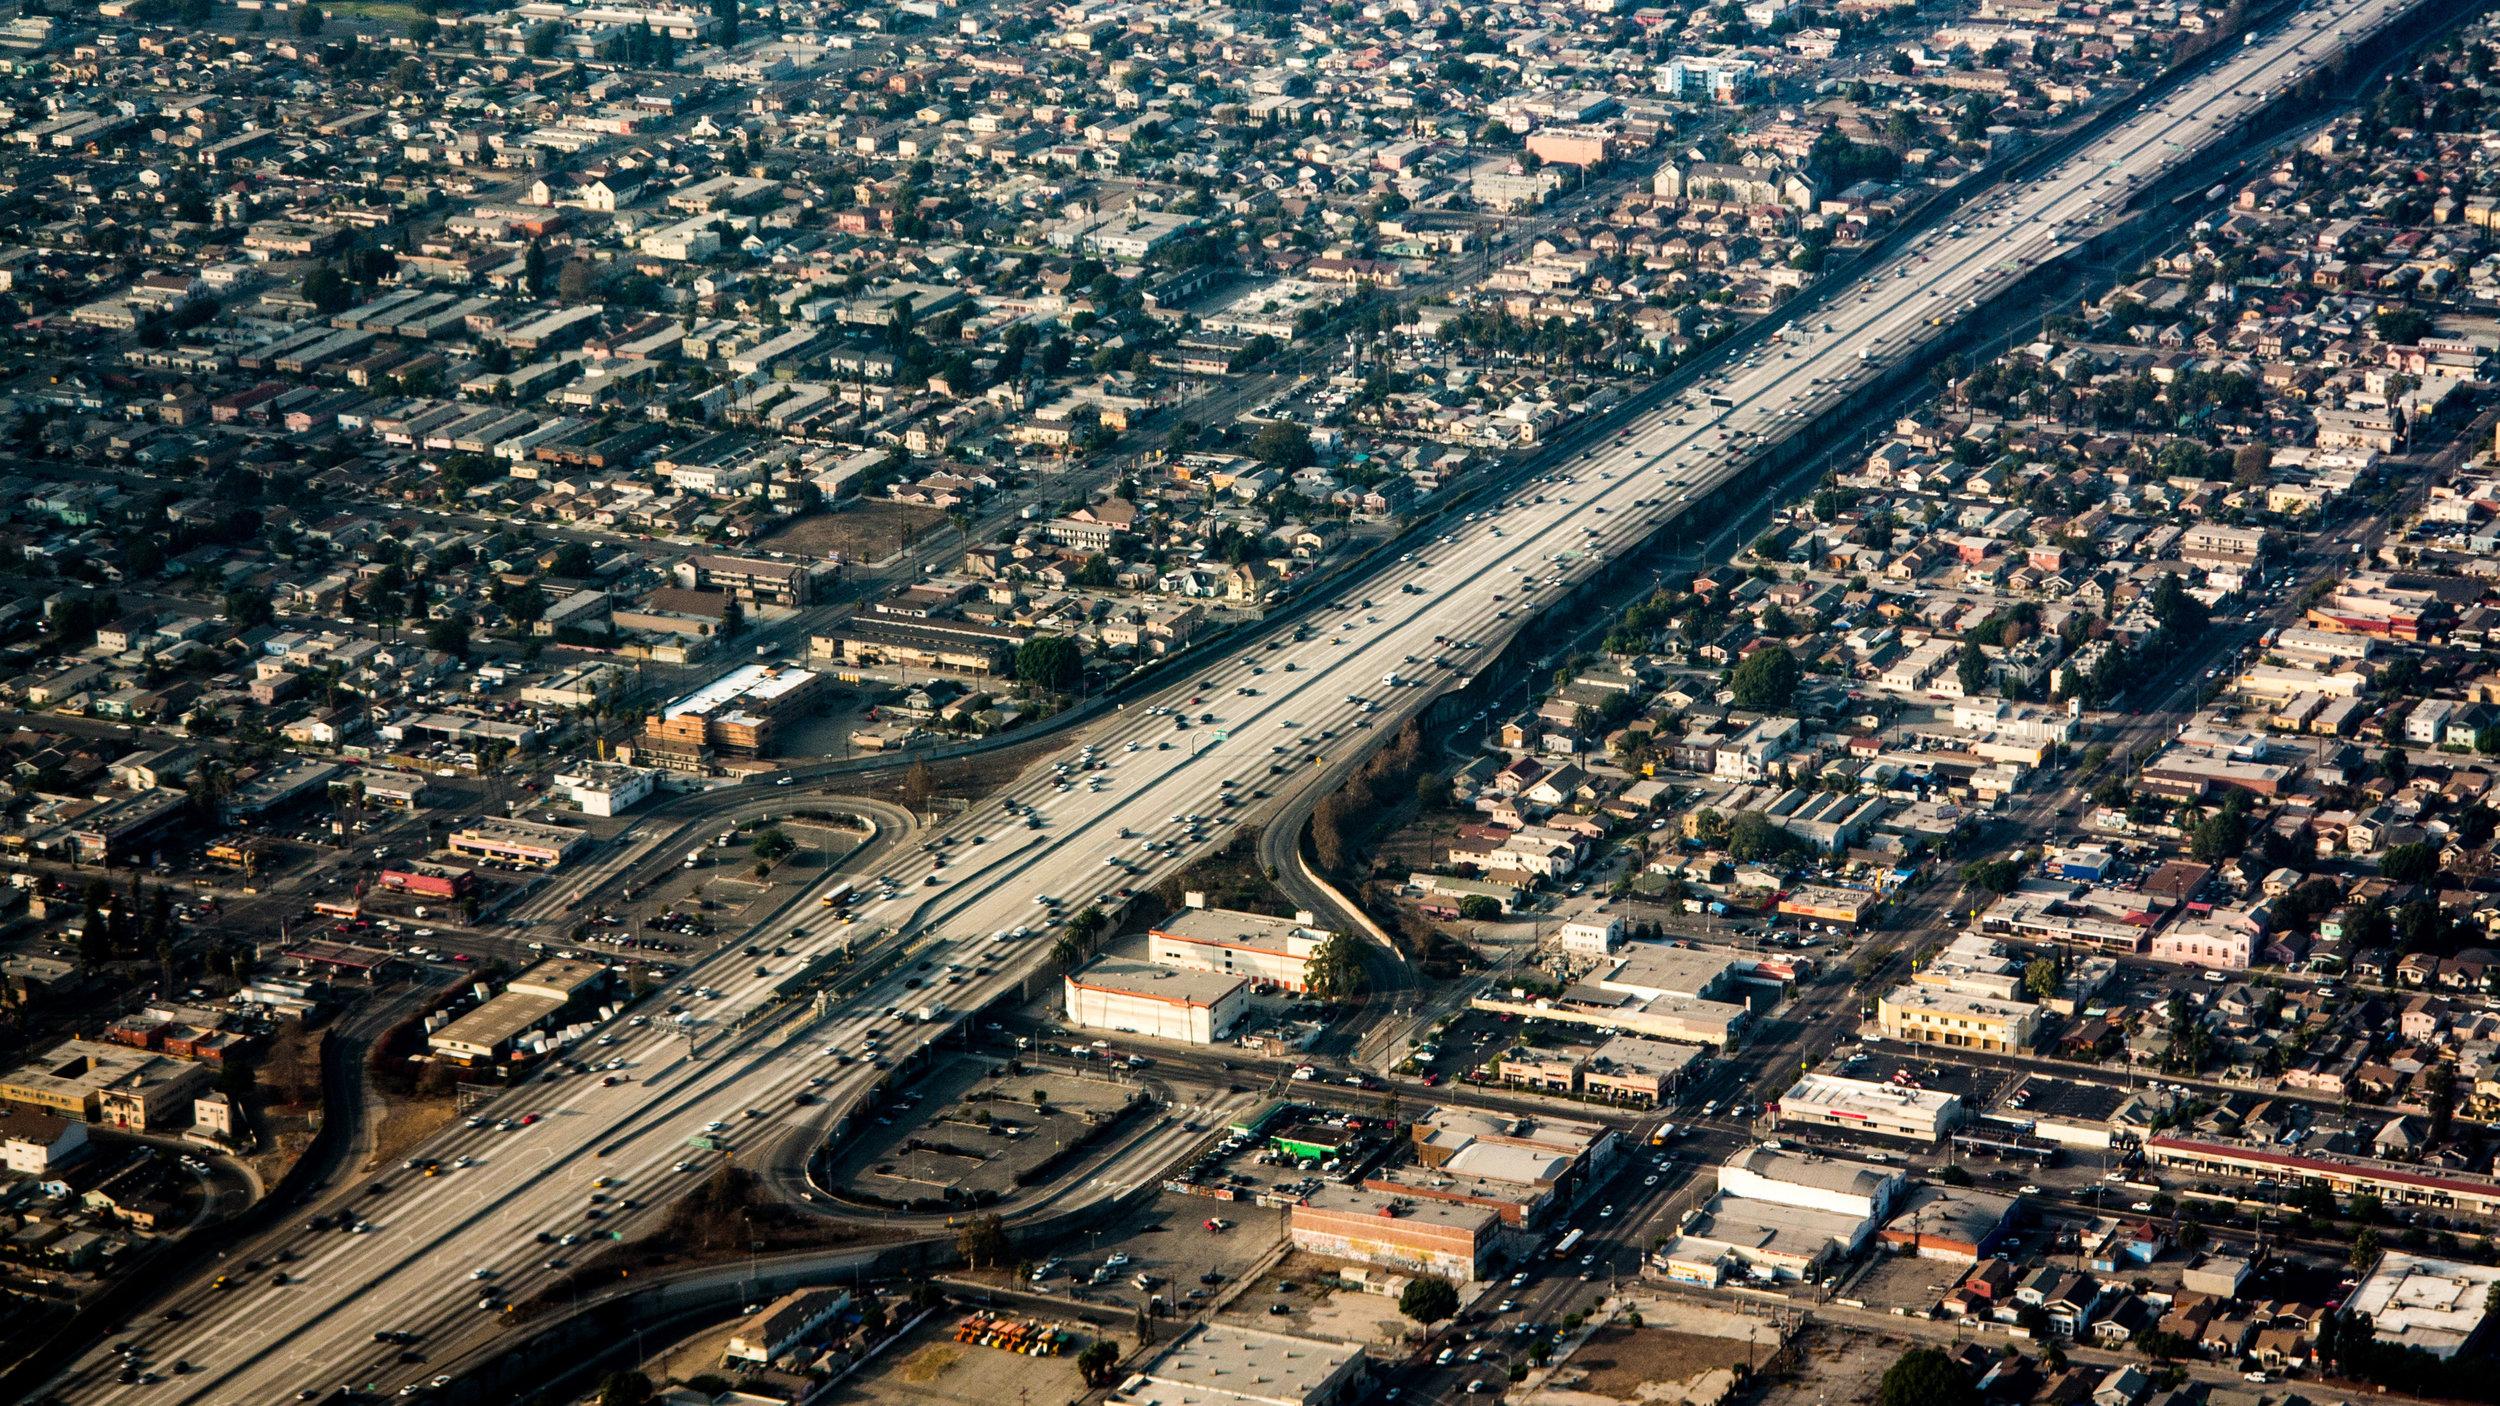 Los Angeles Freeway 20131023 5mb-3612-4-16x9.jpg